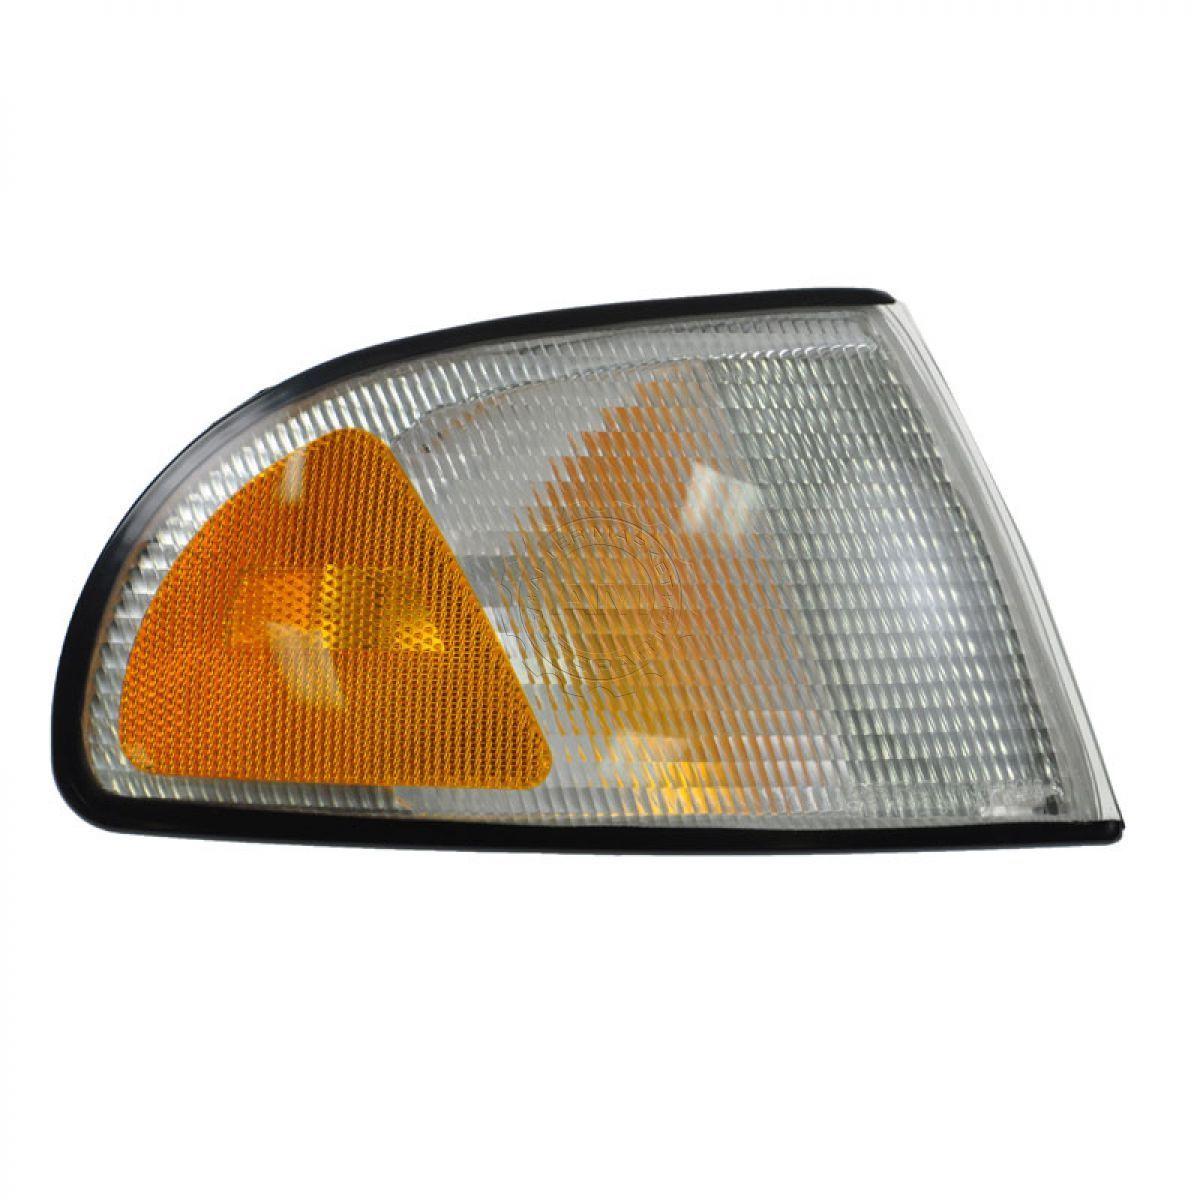 USコーナーライト Corner Parking Marker Light Right Hand Passenger Side RH RF for 96-99 Audi A4 コーナーパーキングマーカライトライト96-99 Audi A4